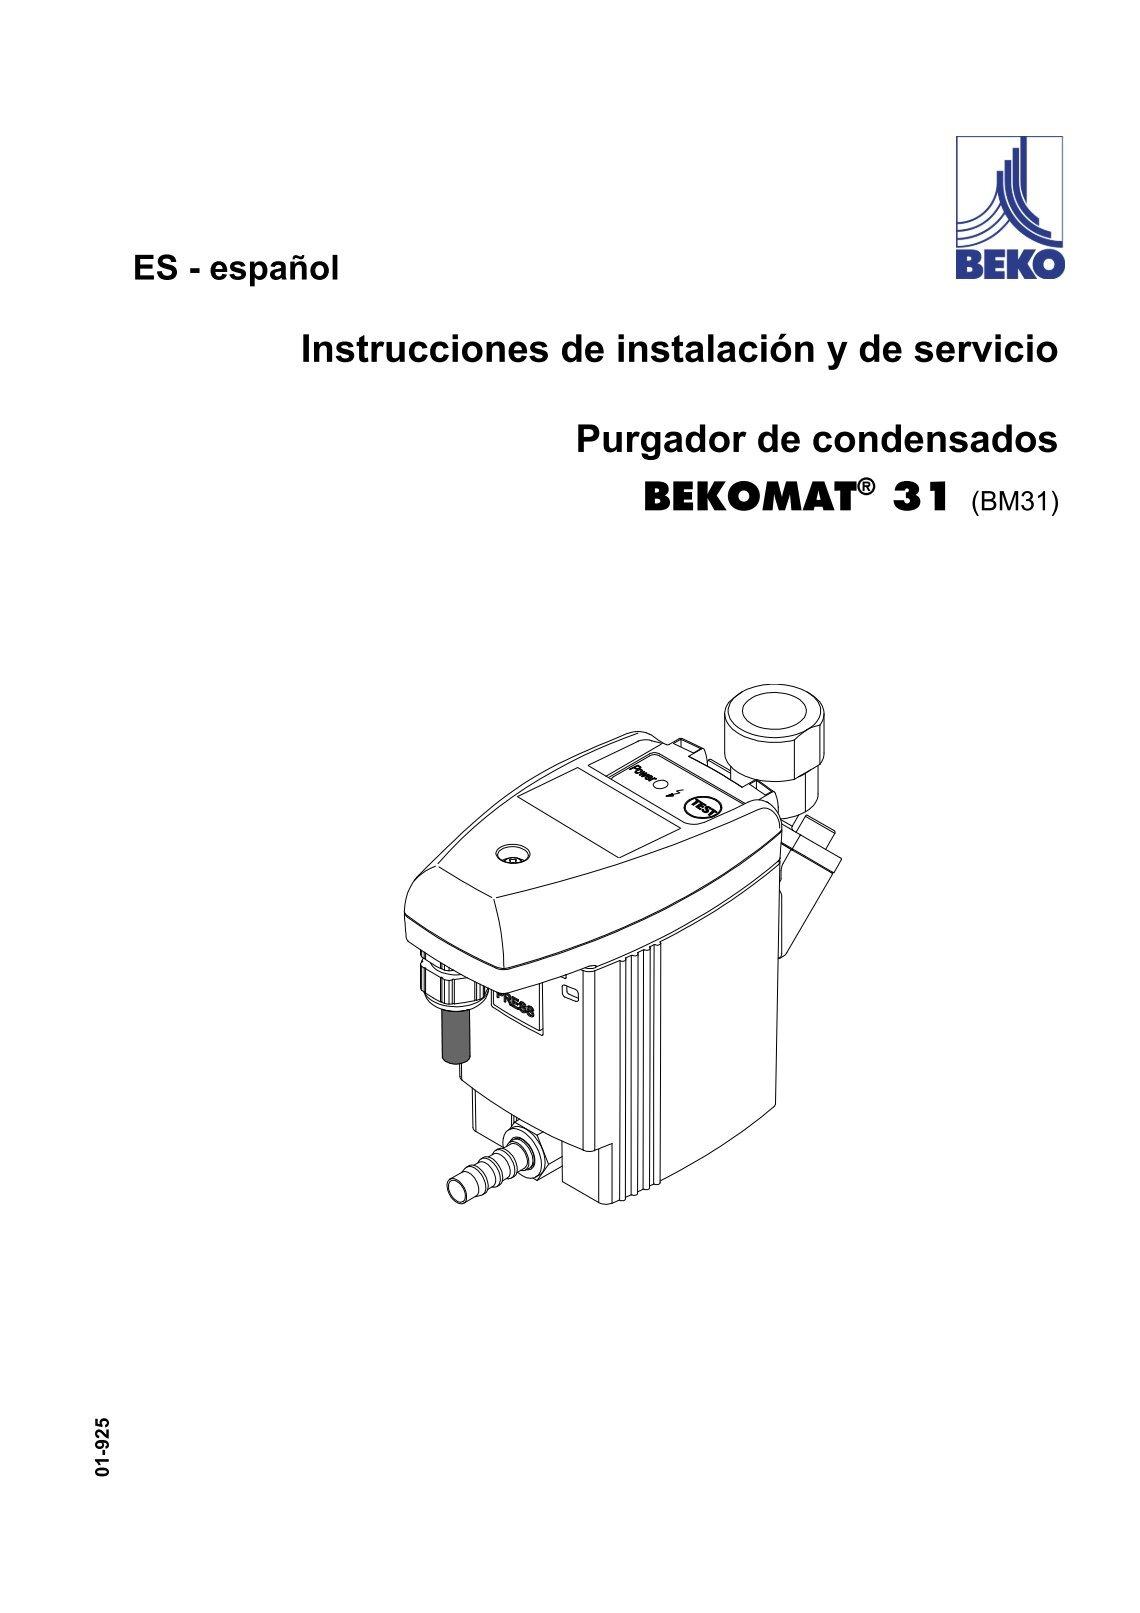 160 free Magazines from BEKO.TECHNOLOGIES.DE